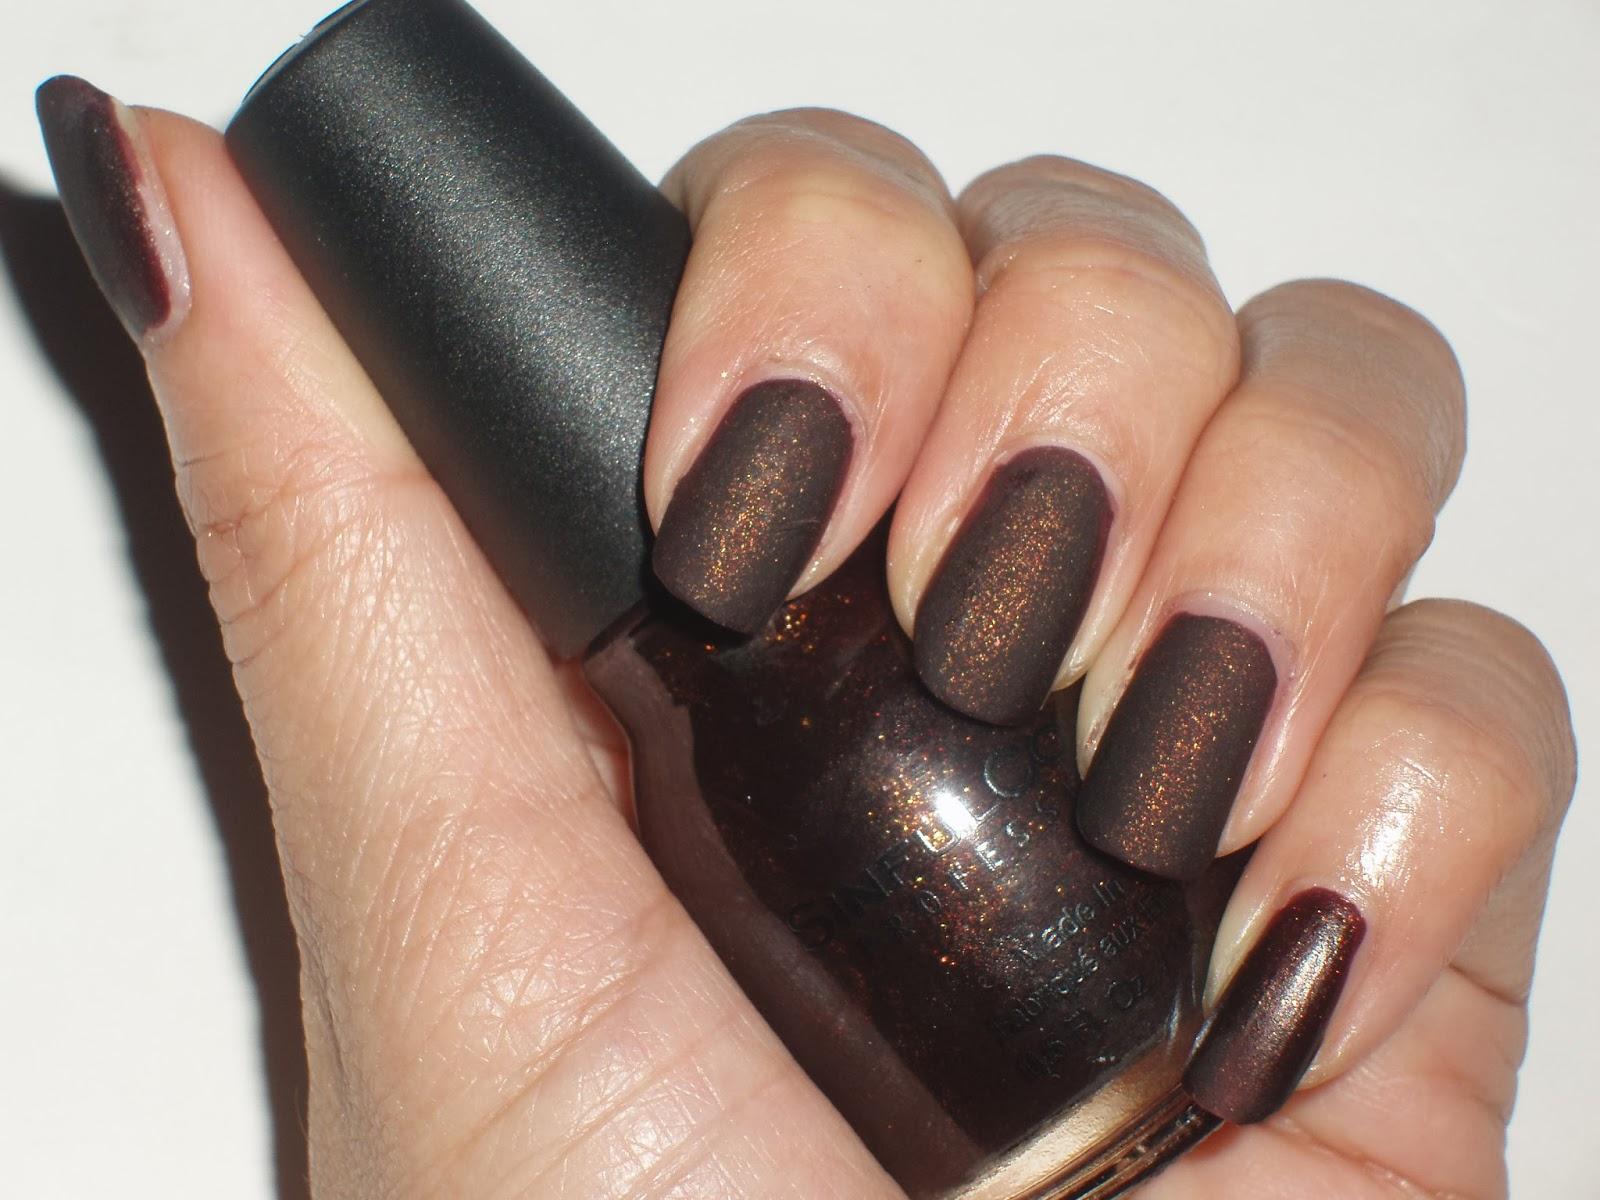 4.bp.blogspot.com_-XQ3QA3MQHVs_Ulie_XrPBMI_AAAAAAAAIt0_UmP3YzEAUyA_s1600_P1010218+-+Sinful+Colors+Leather+Loose